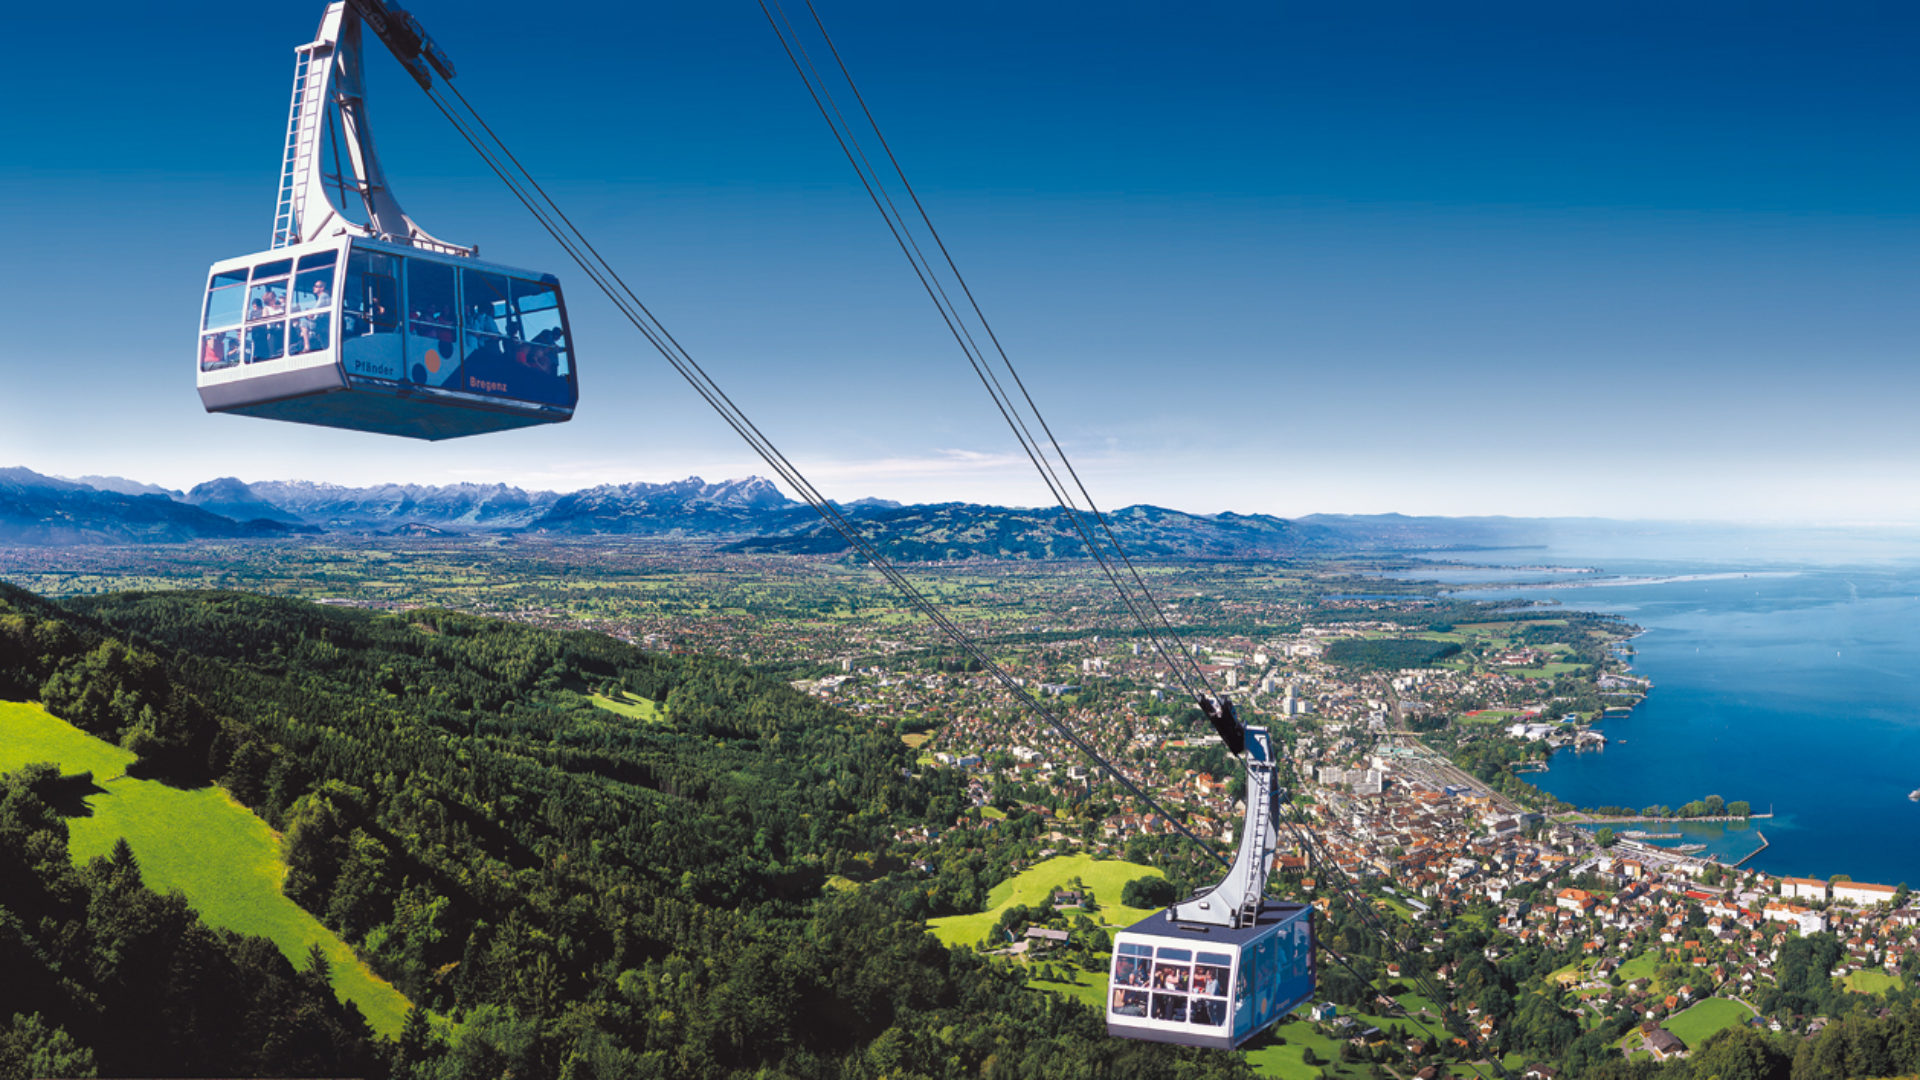 Pfänderbahn, Bergbahn, Seilbahn, Panorama Bodensee, V-CARD (c) Otmar Heidegger / Vorarlberg Tourismus